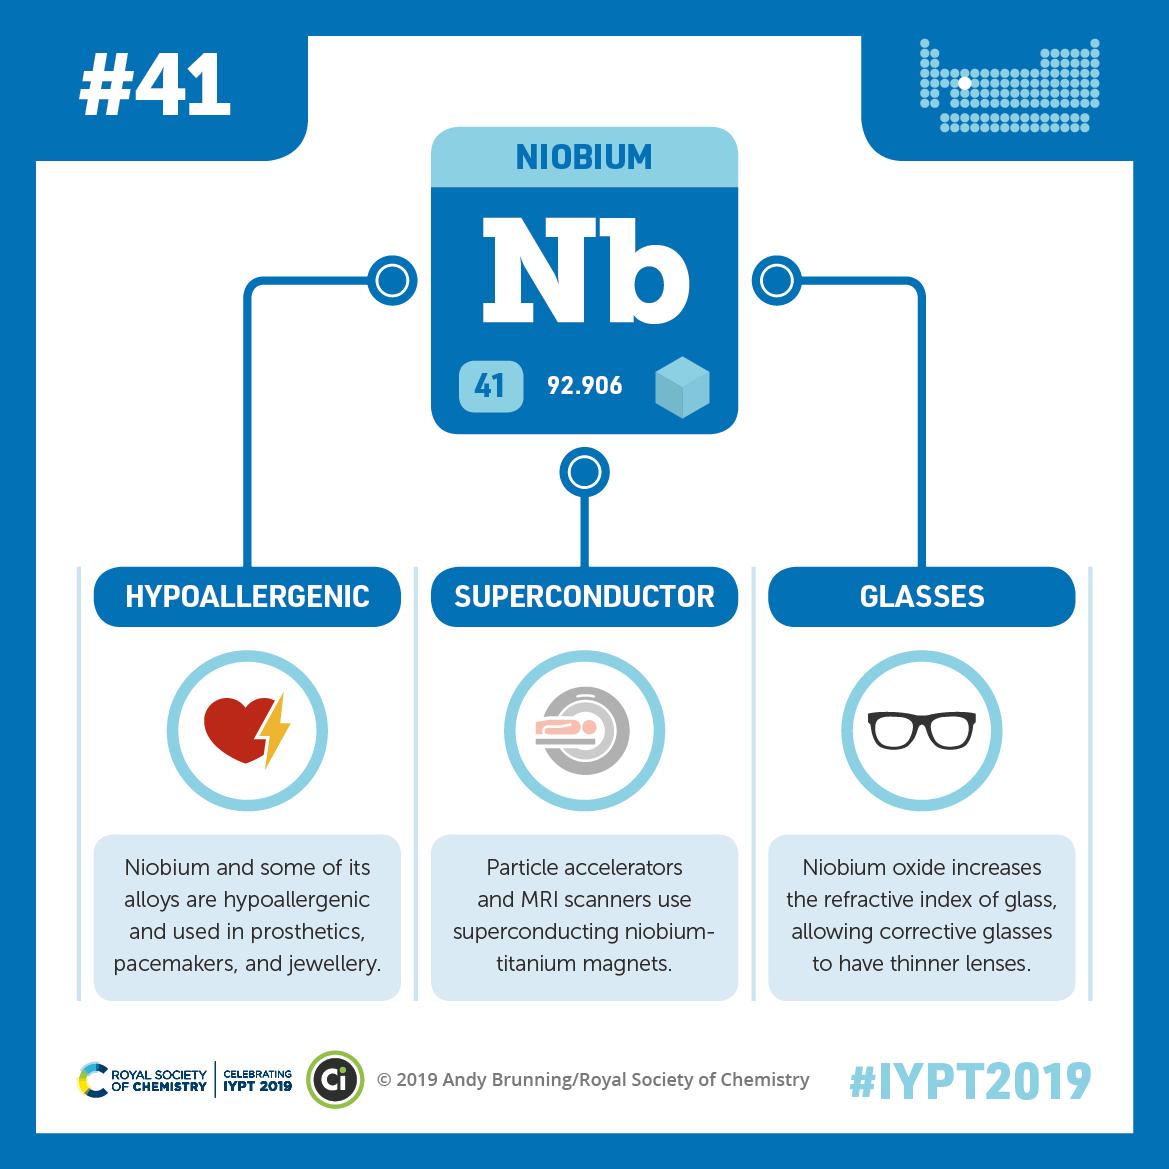 IYPT 2019 Elements 041: Niobium: Particle accelerators and corrective glasses